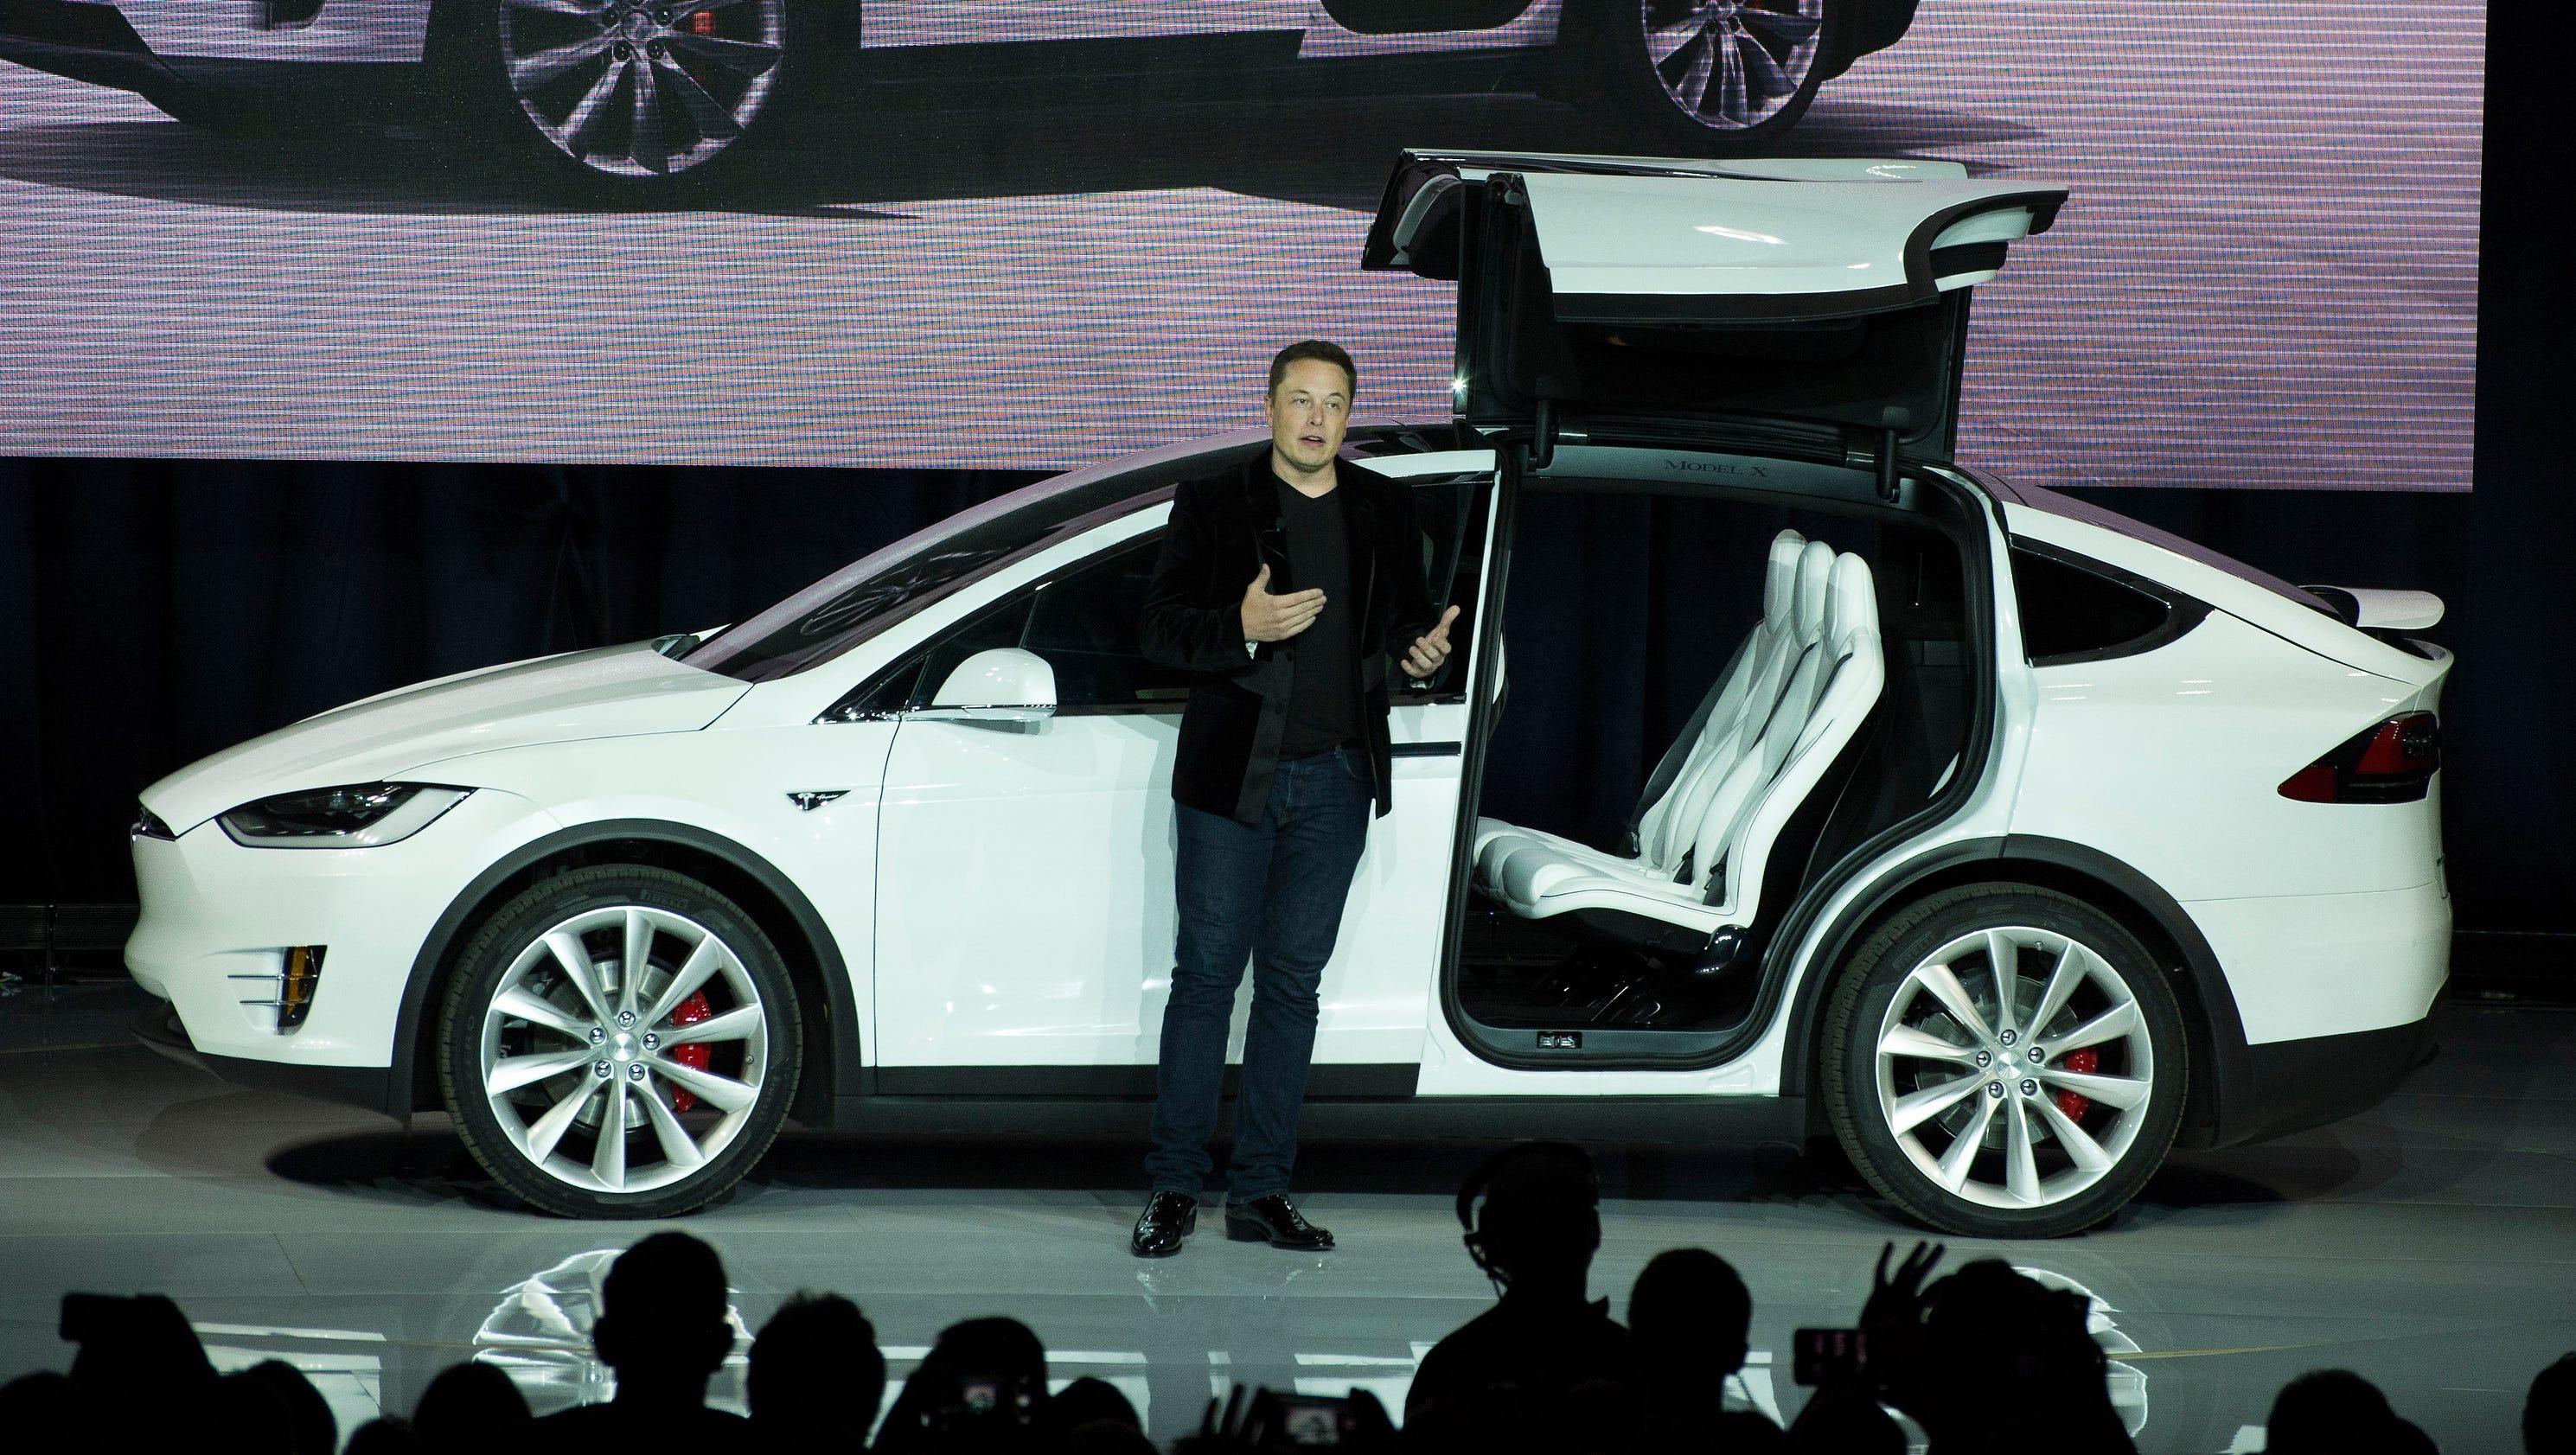 Tesla prices novel Model X SUV at $80,000